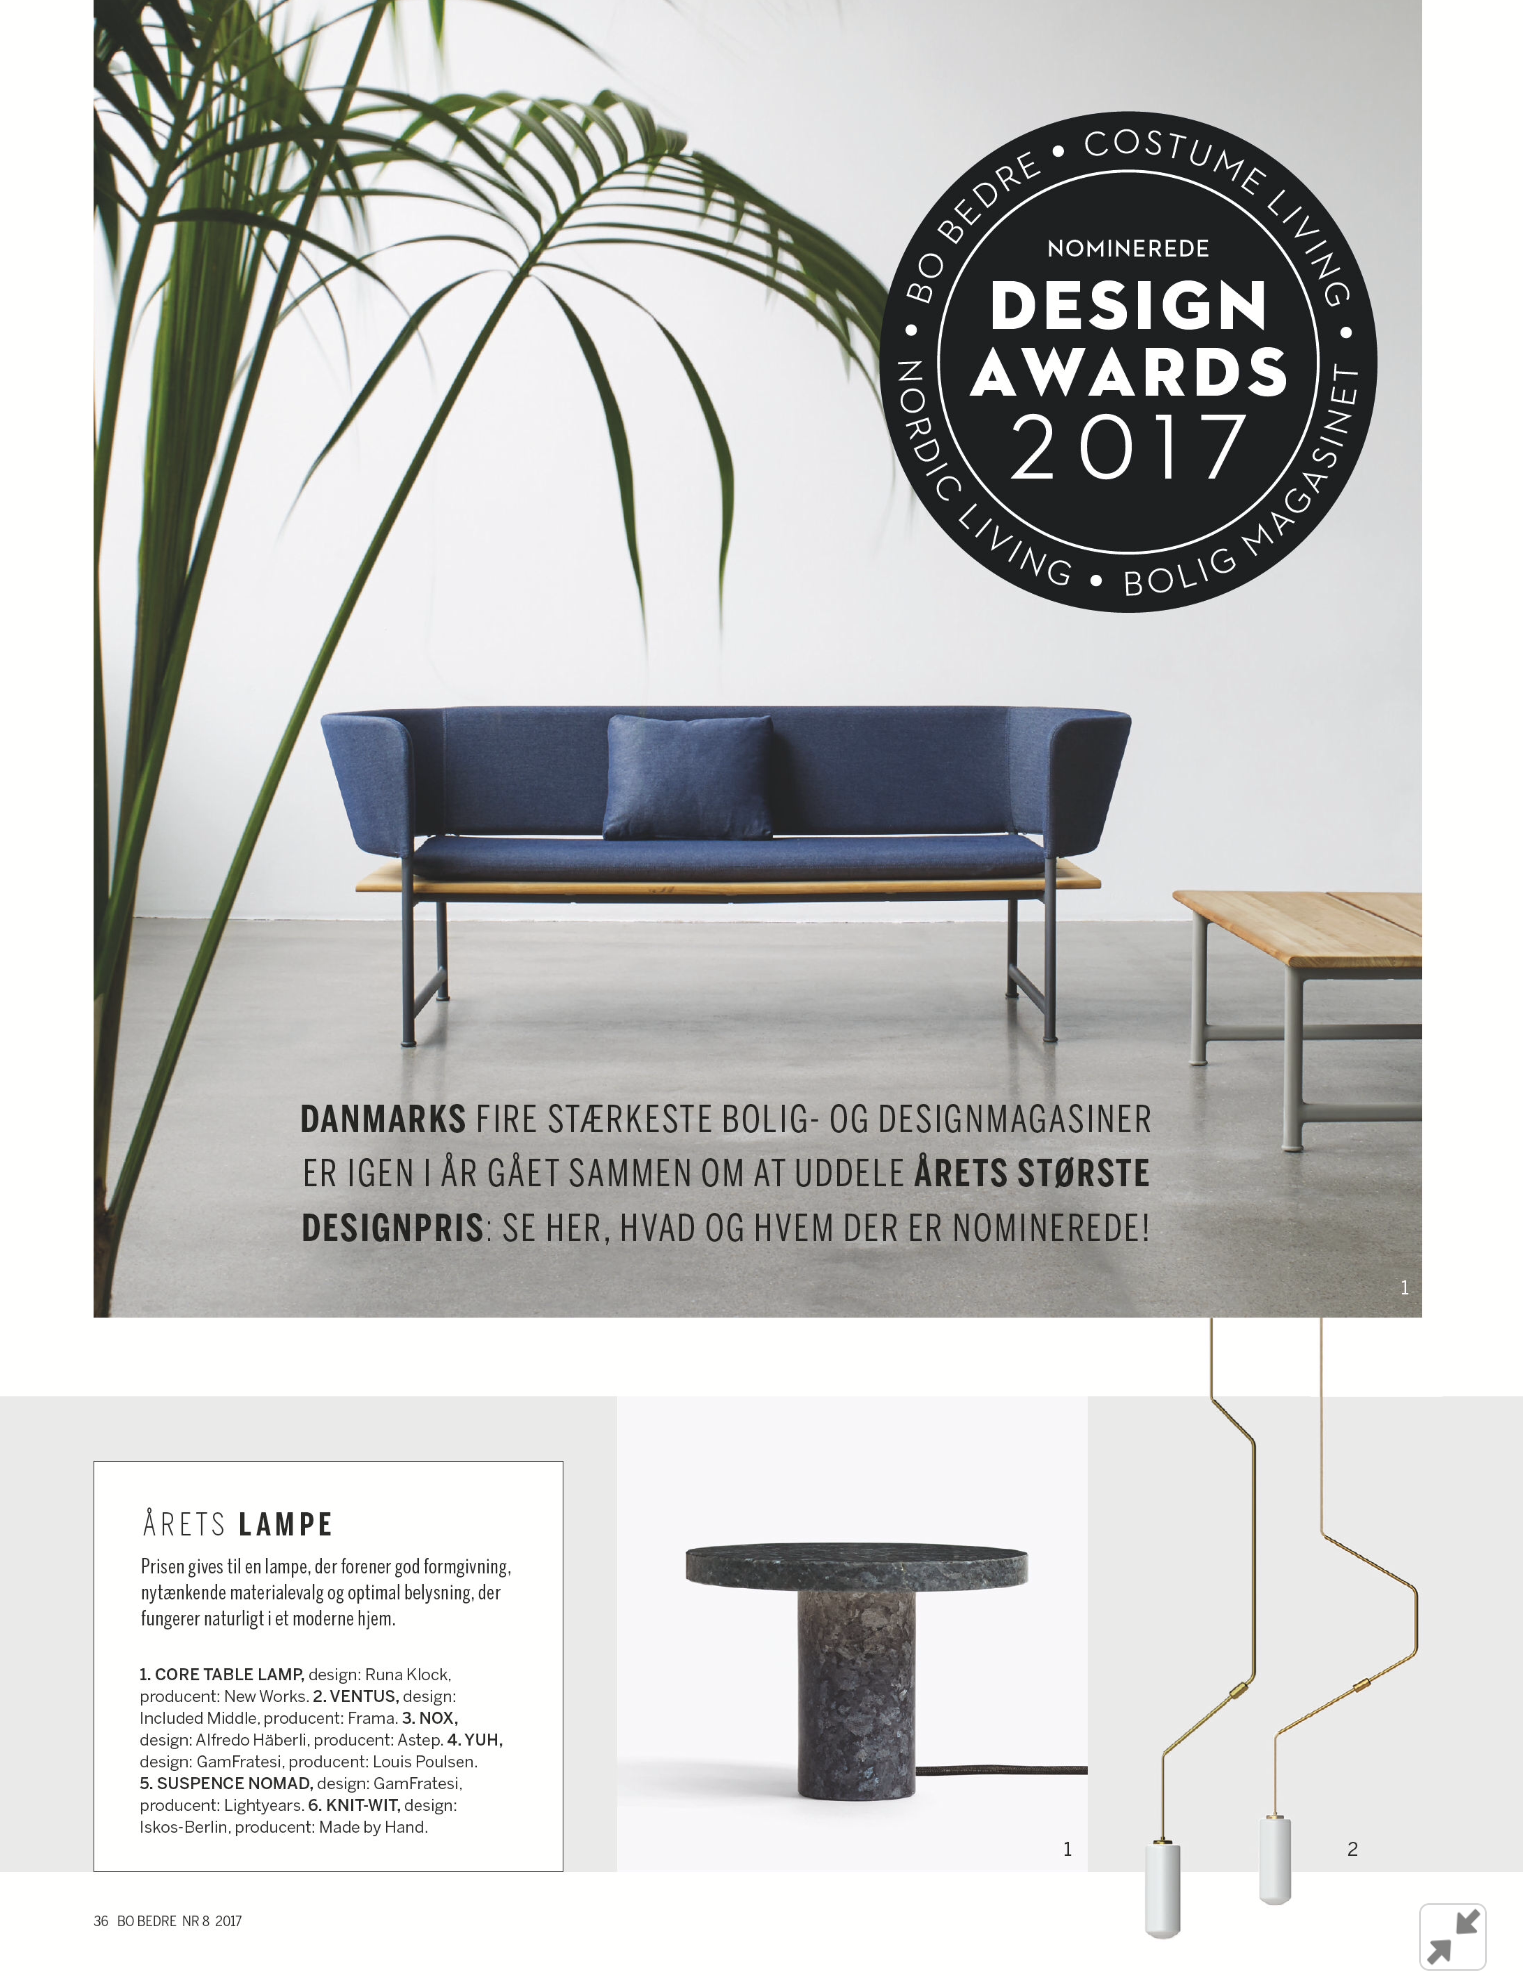 Design Award 2017 - Lamp of the Year!